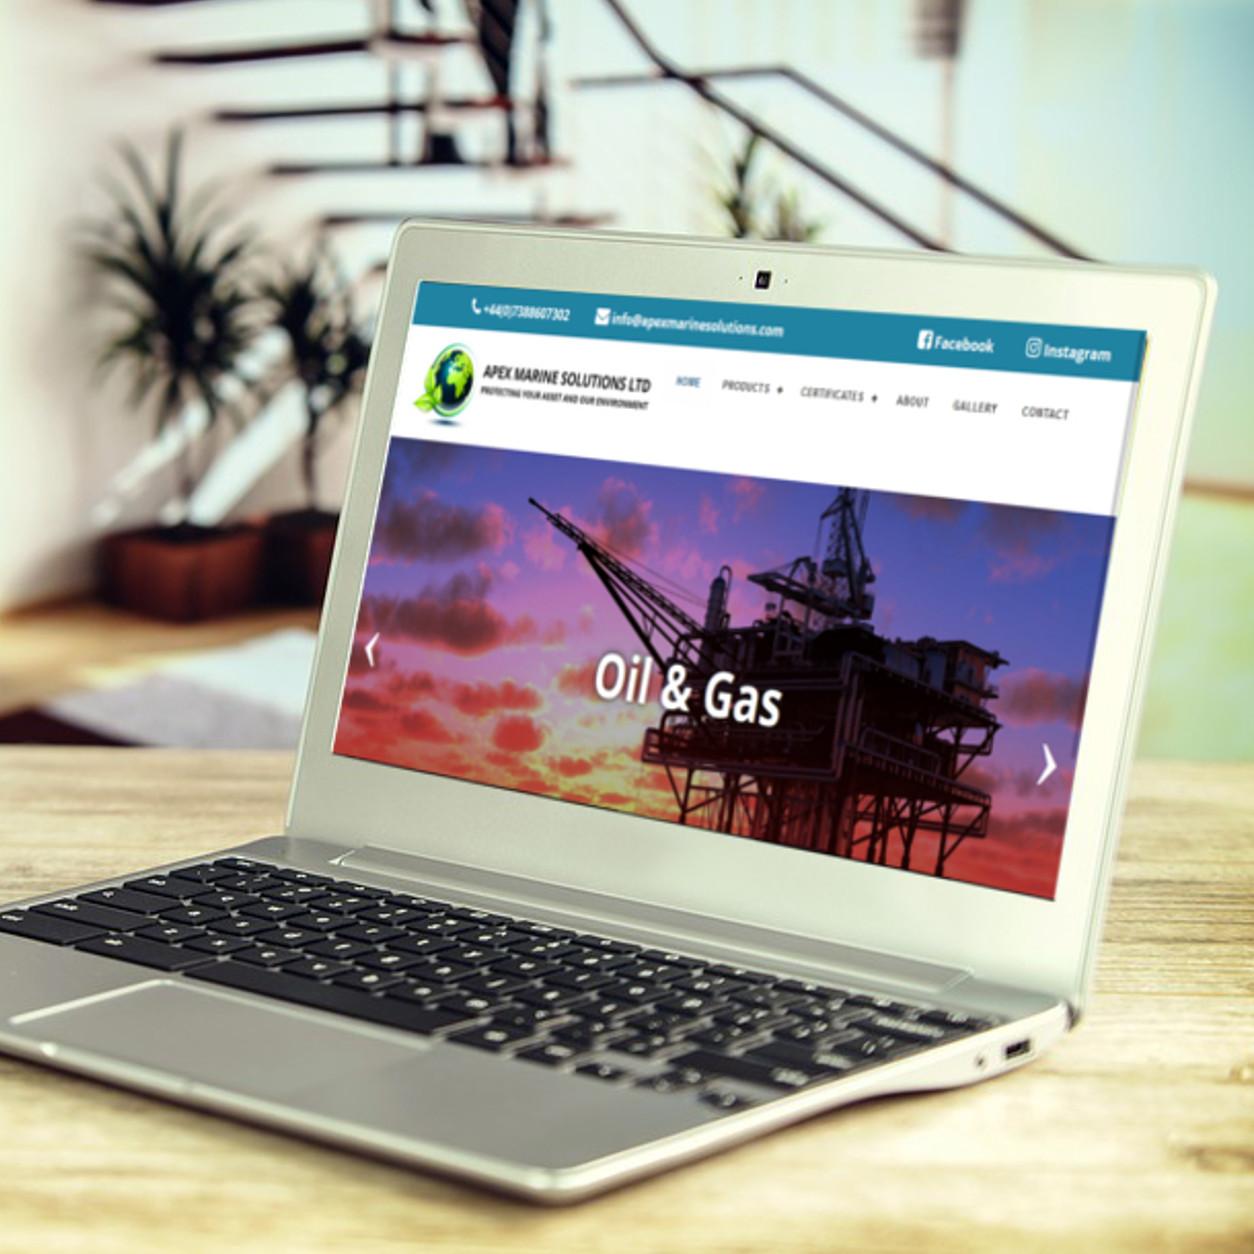 Apex Marine Solutions | Website Design | Website Preview Image